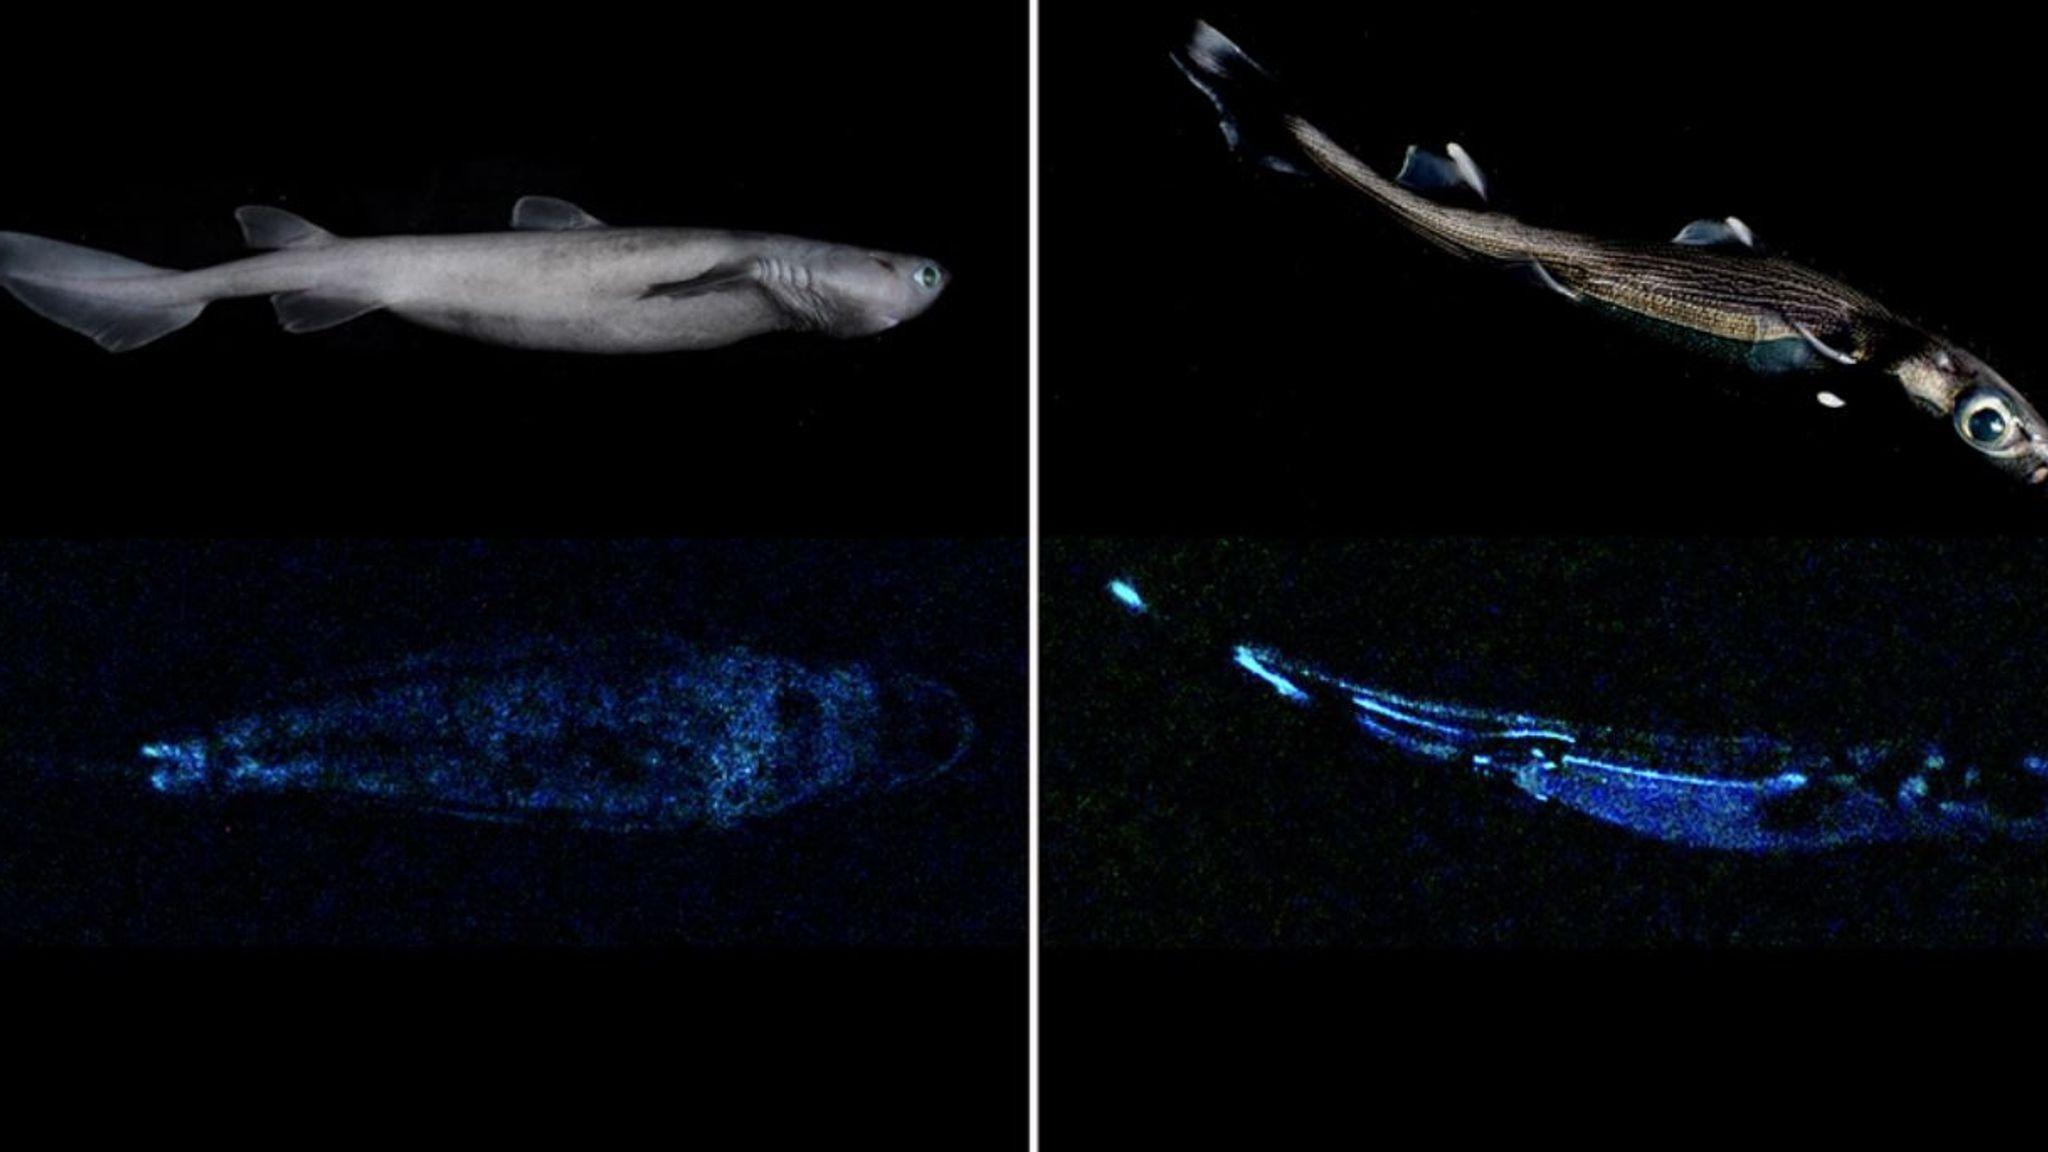 Scientists find three new shark species that glow in the dark | Offbeat  News | Sky News